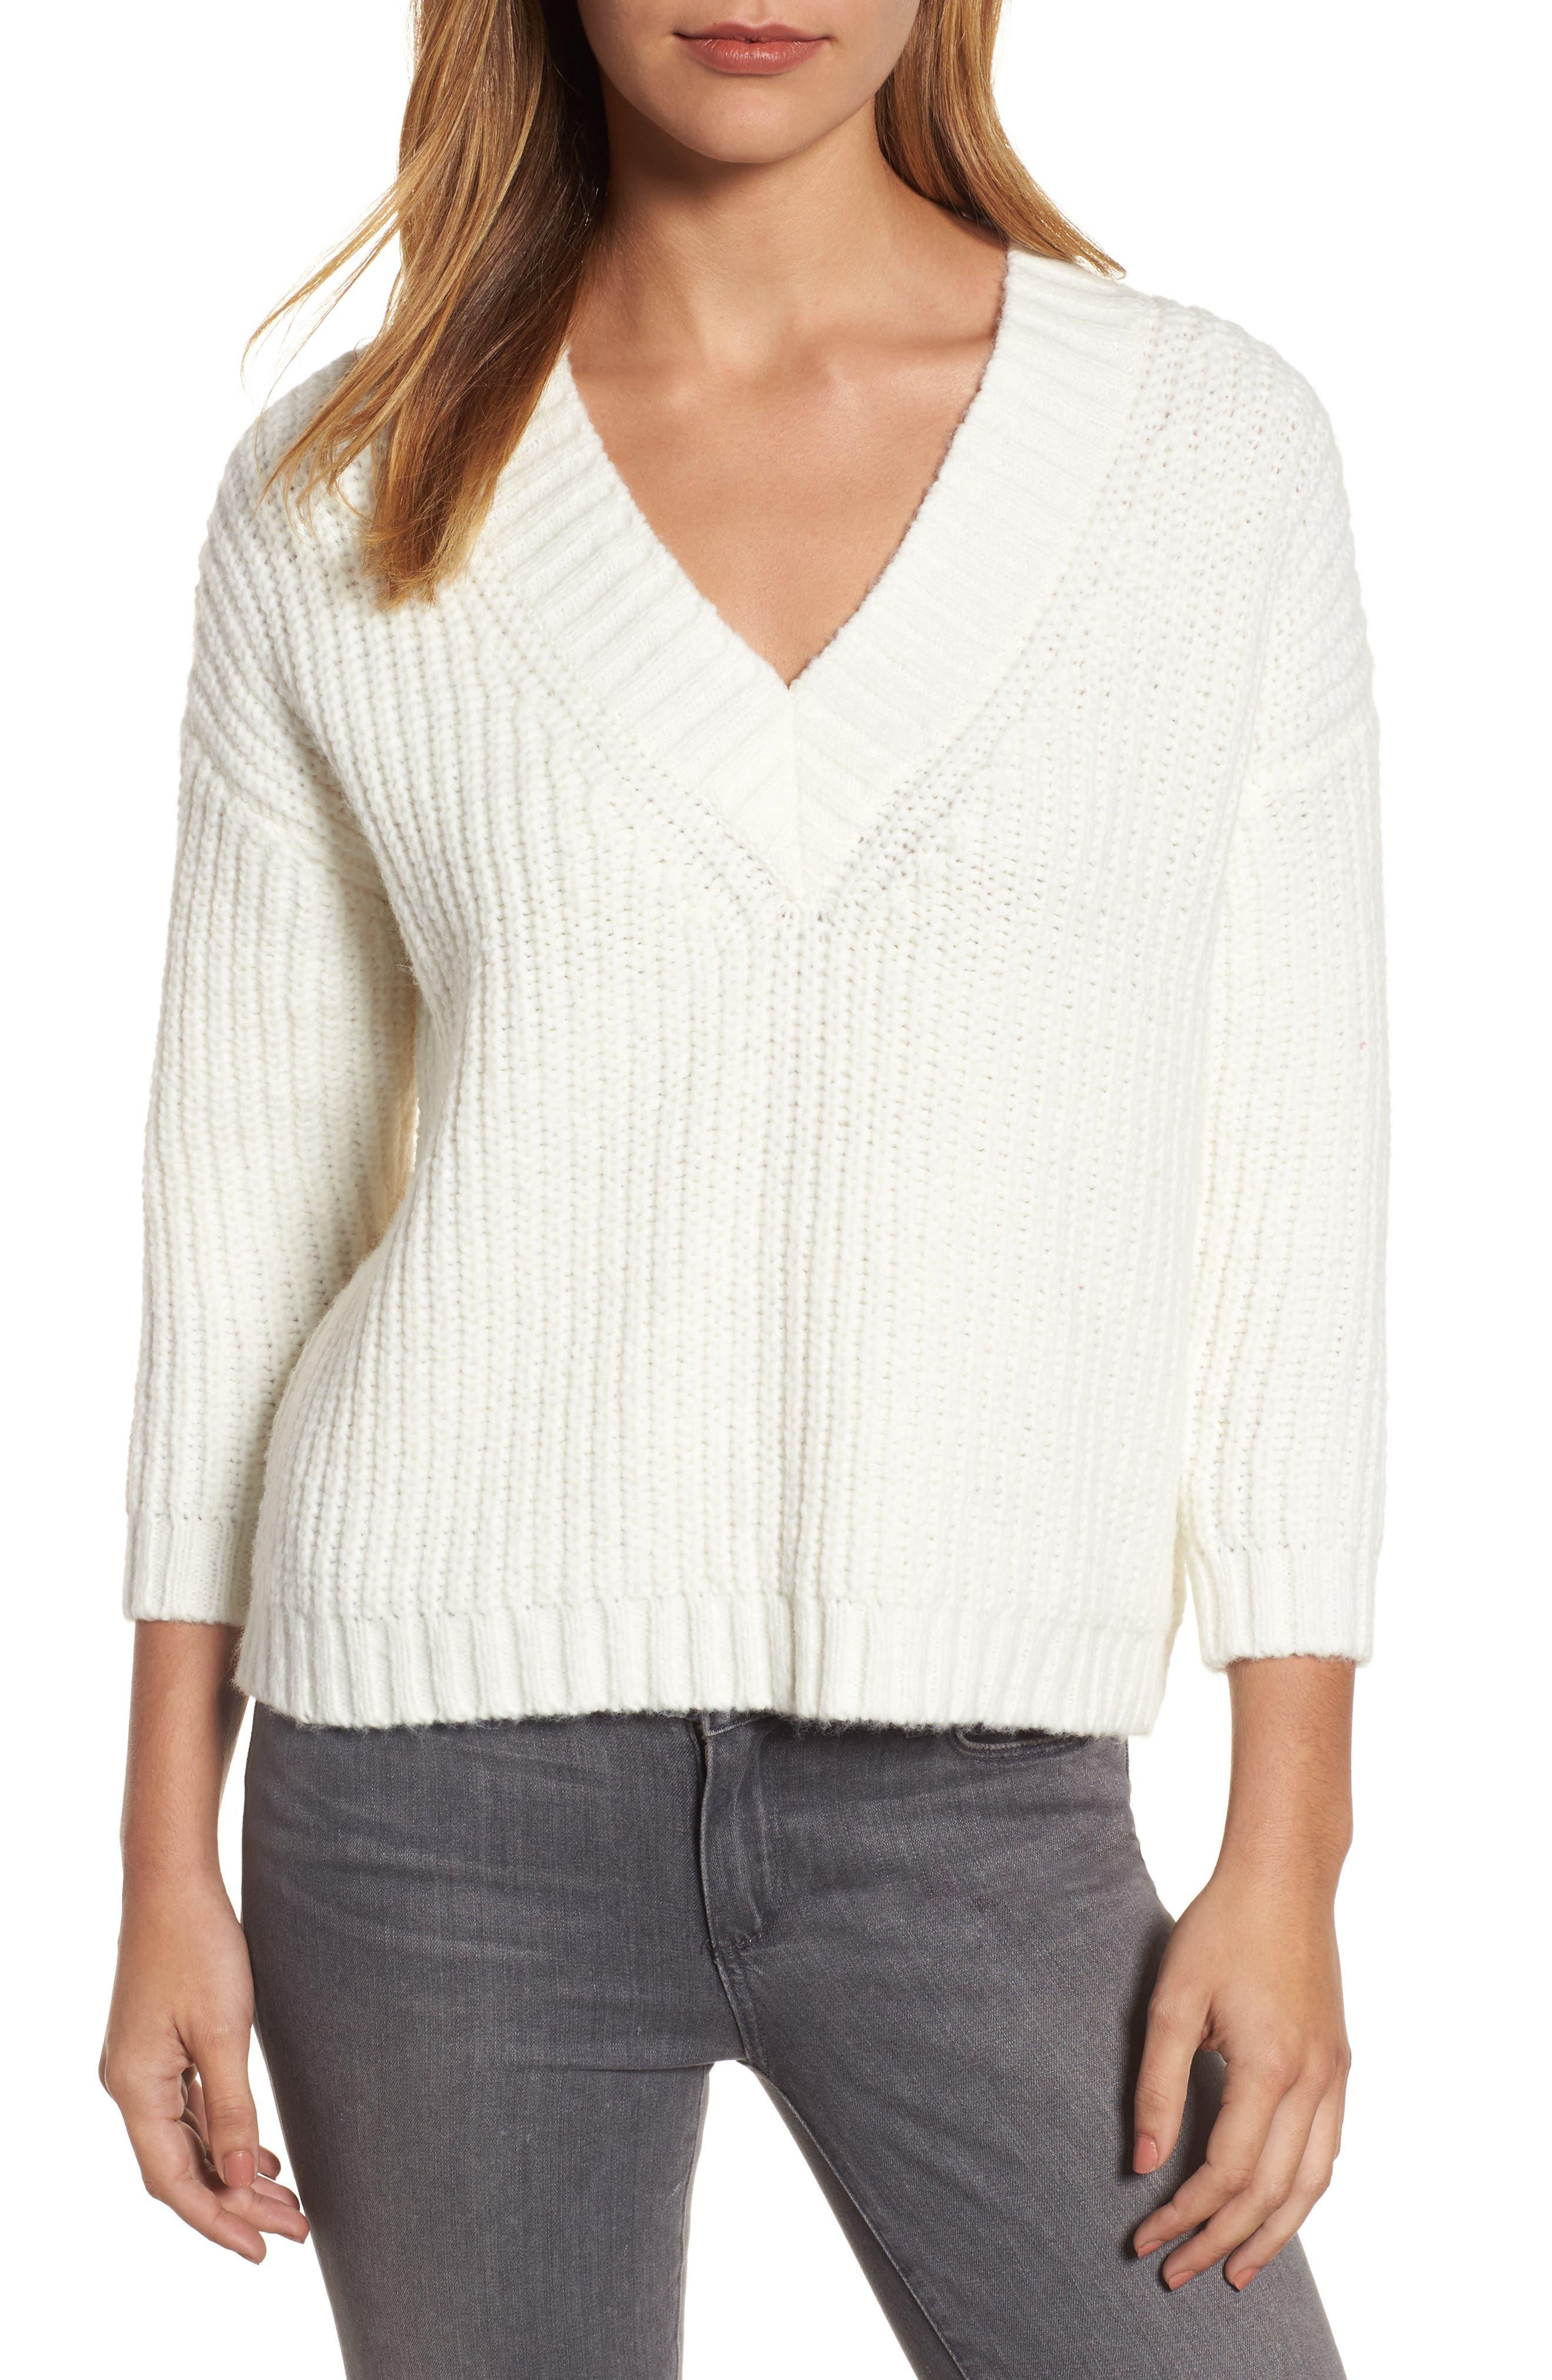 Main Image - Press Lace Up Back V-Neck Sweater